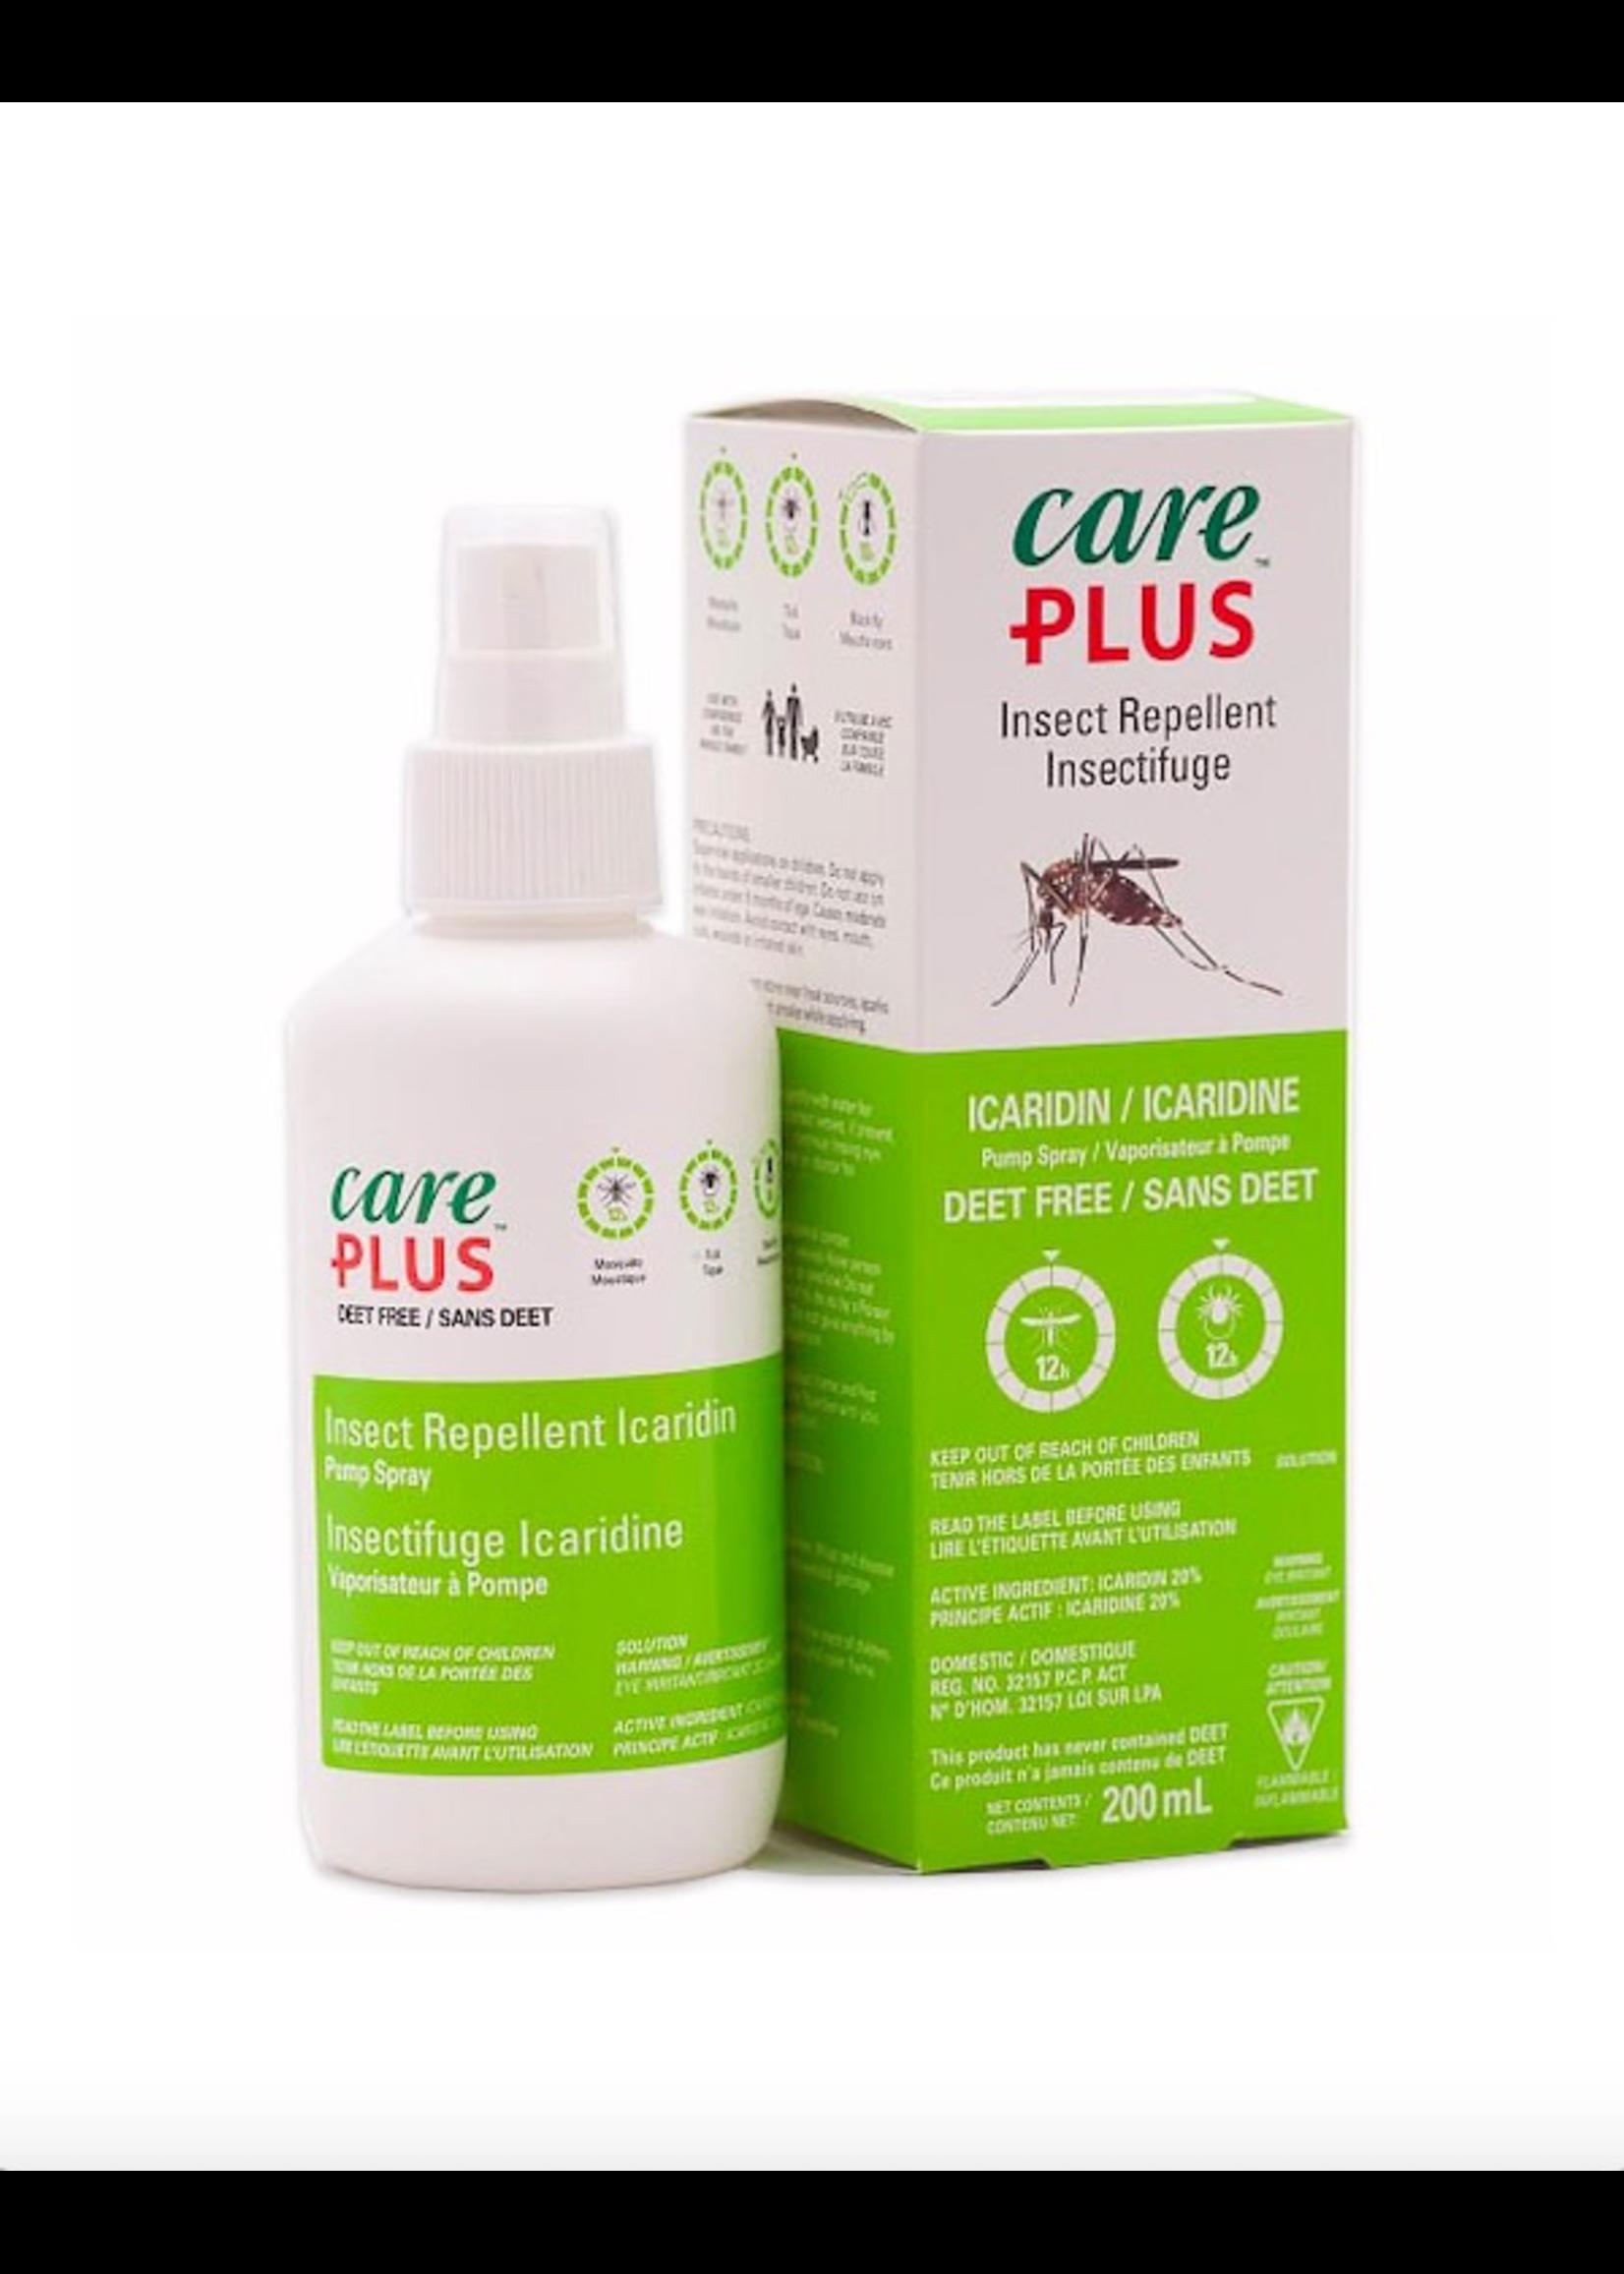 Care Plus Care Plus, Insect Repellent 100ml